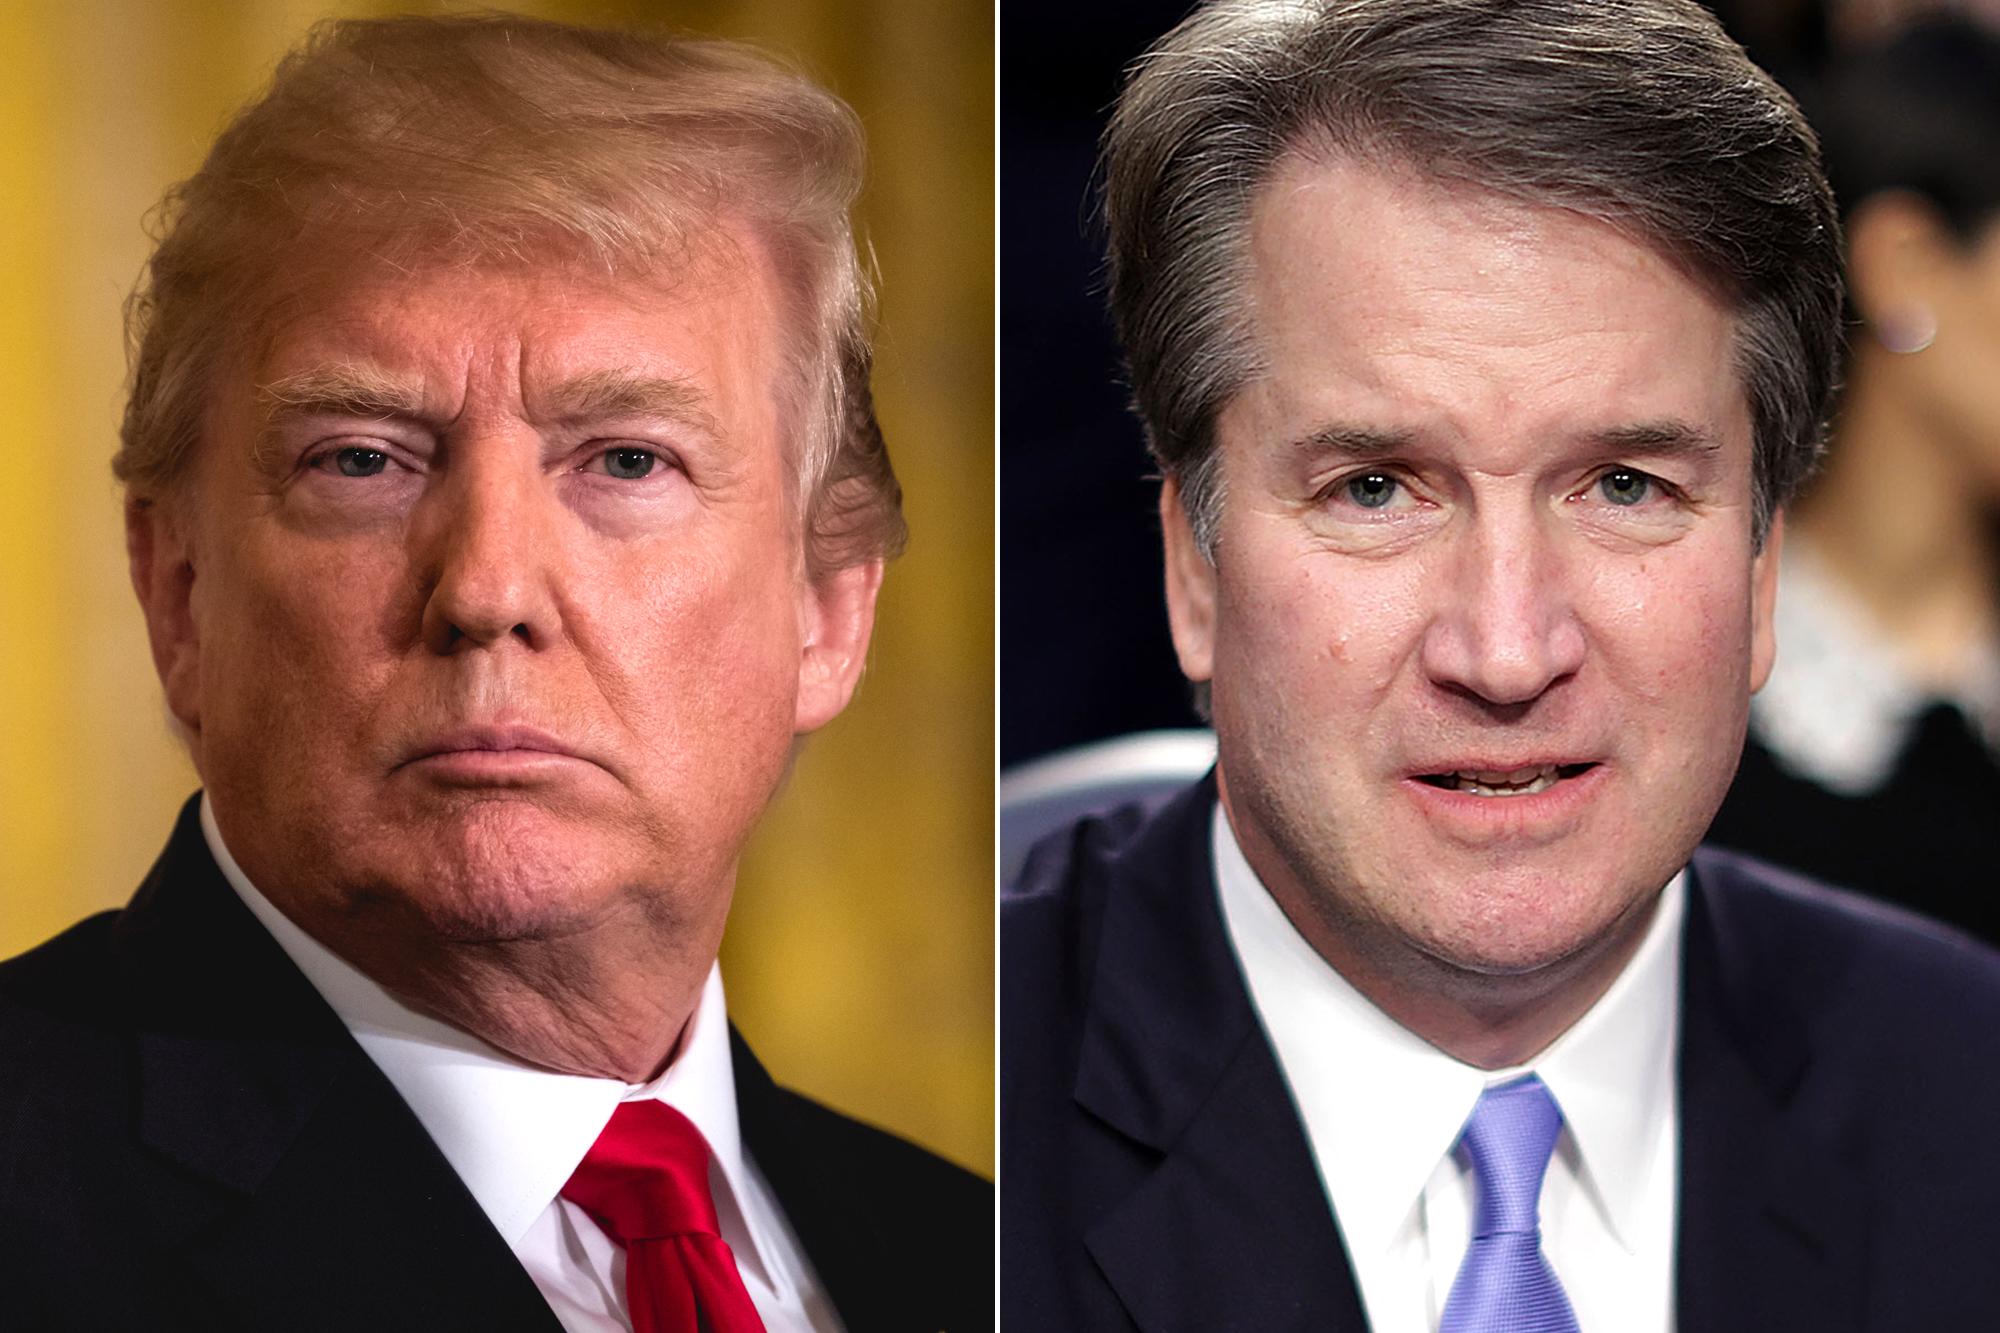 Donald Trump Brett Kavanaugh New Accusation